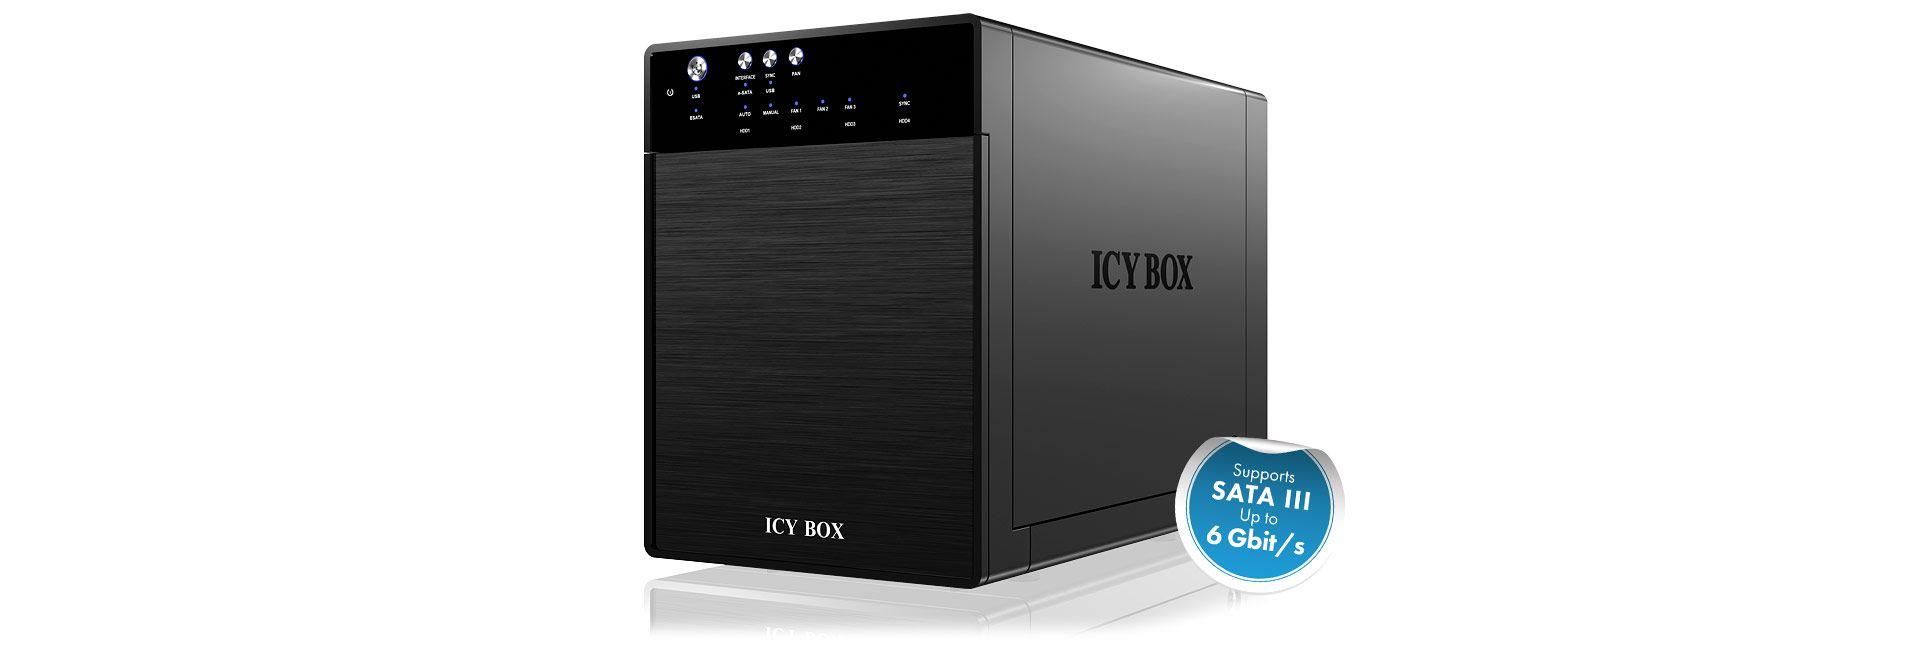 Raidsonic IcyBox IB-3640SU3 External 4x JBOD enclosure with eSATA and USB 3.0 for 3.5 SATA hard drives (IB-3640SU3)